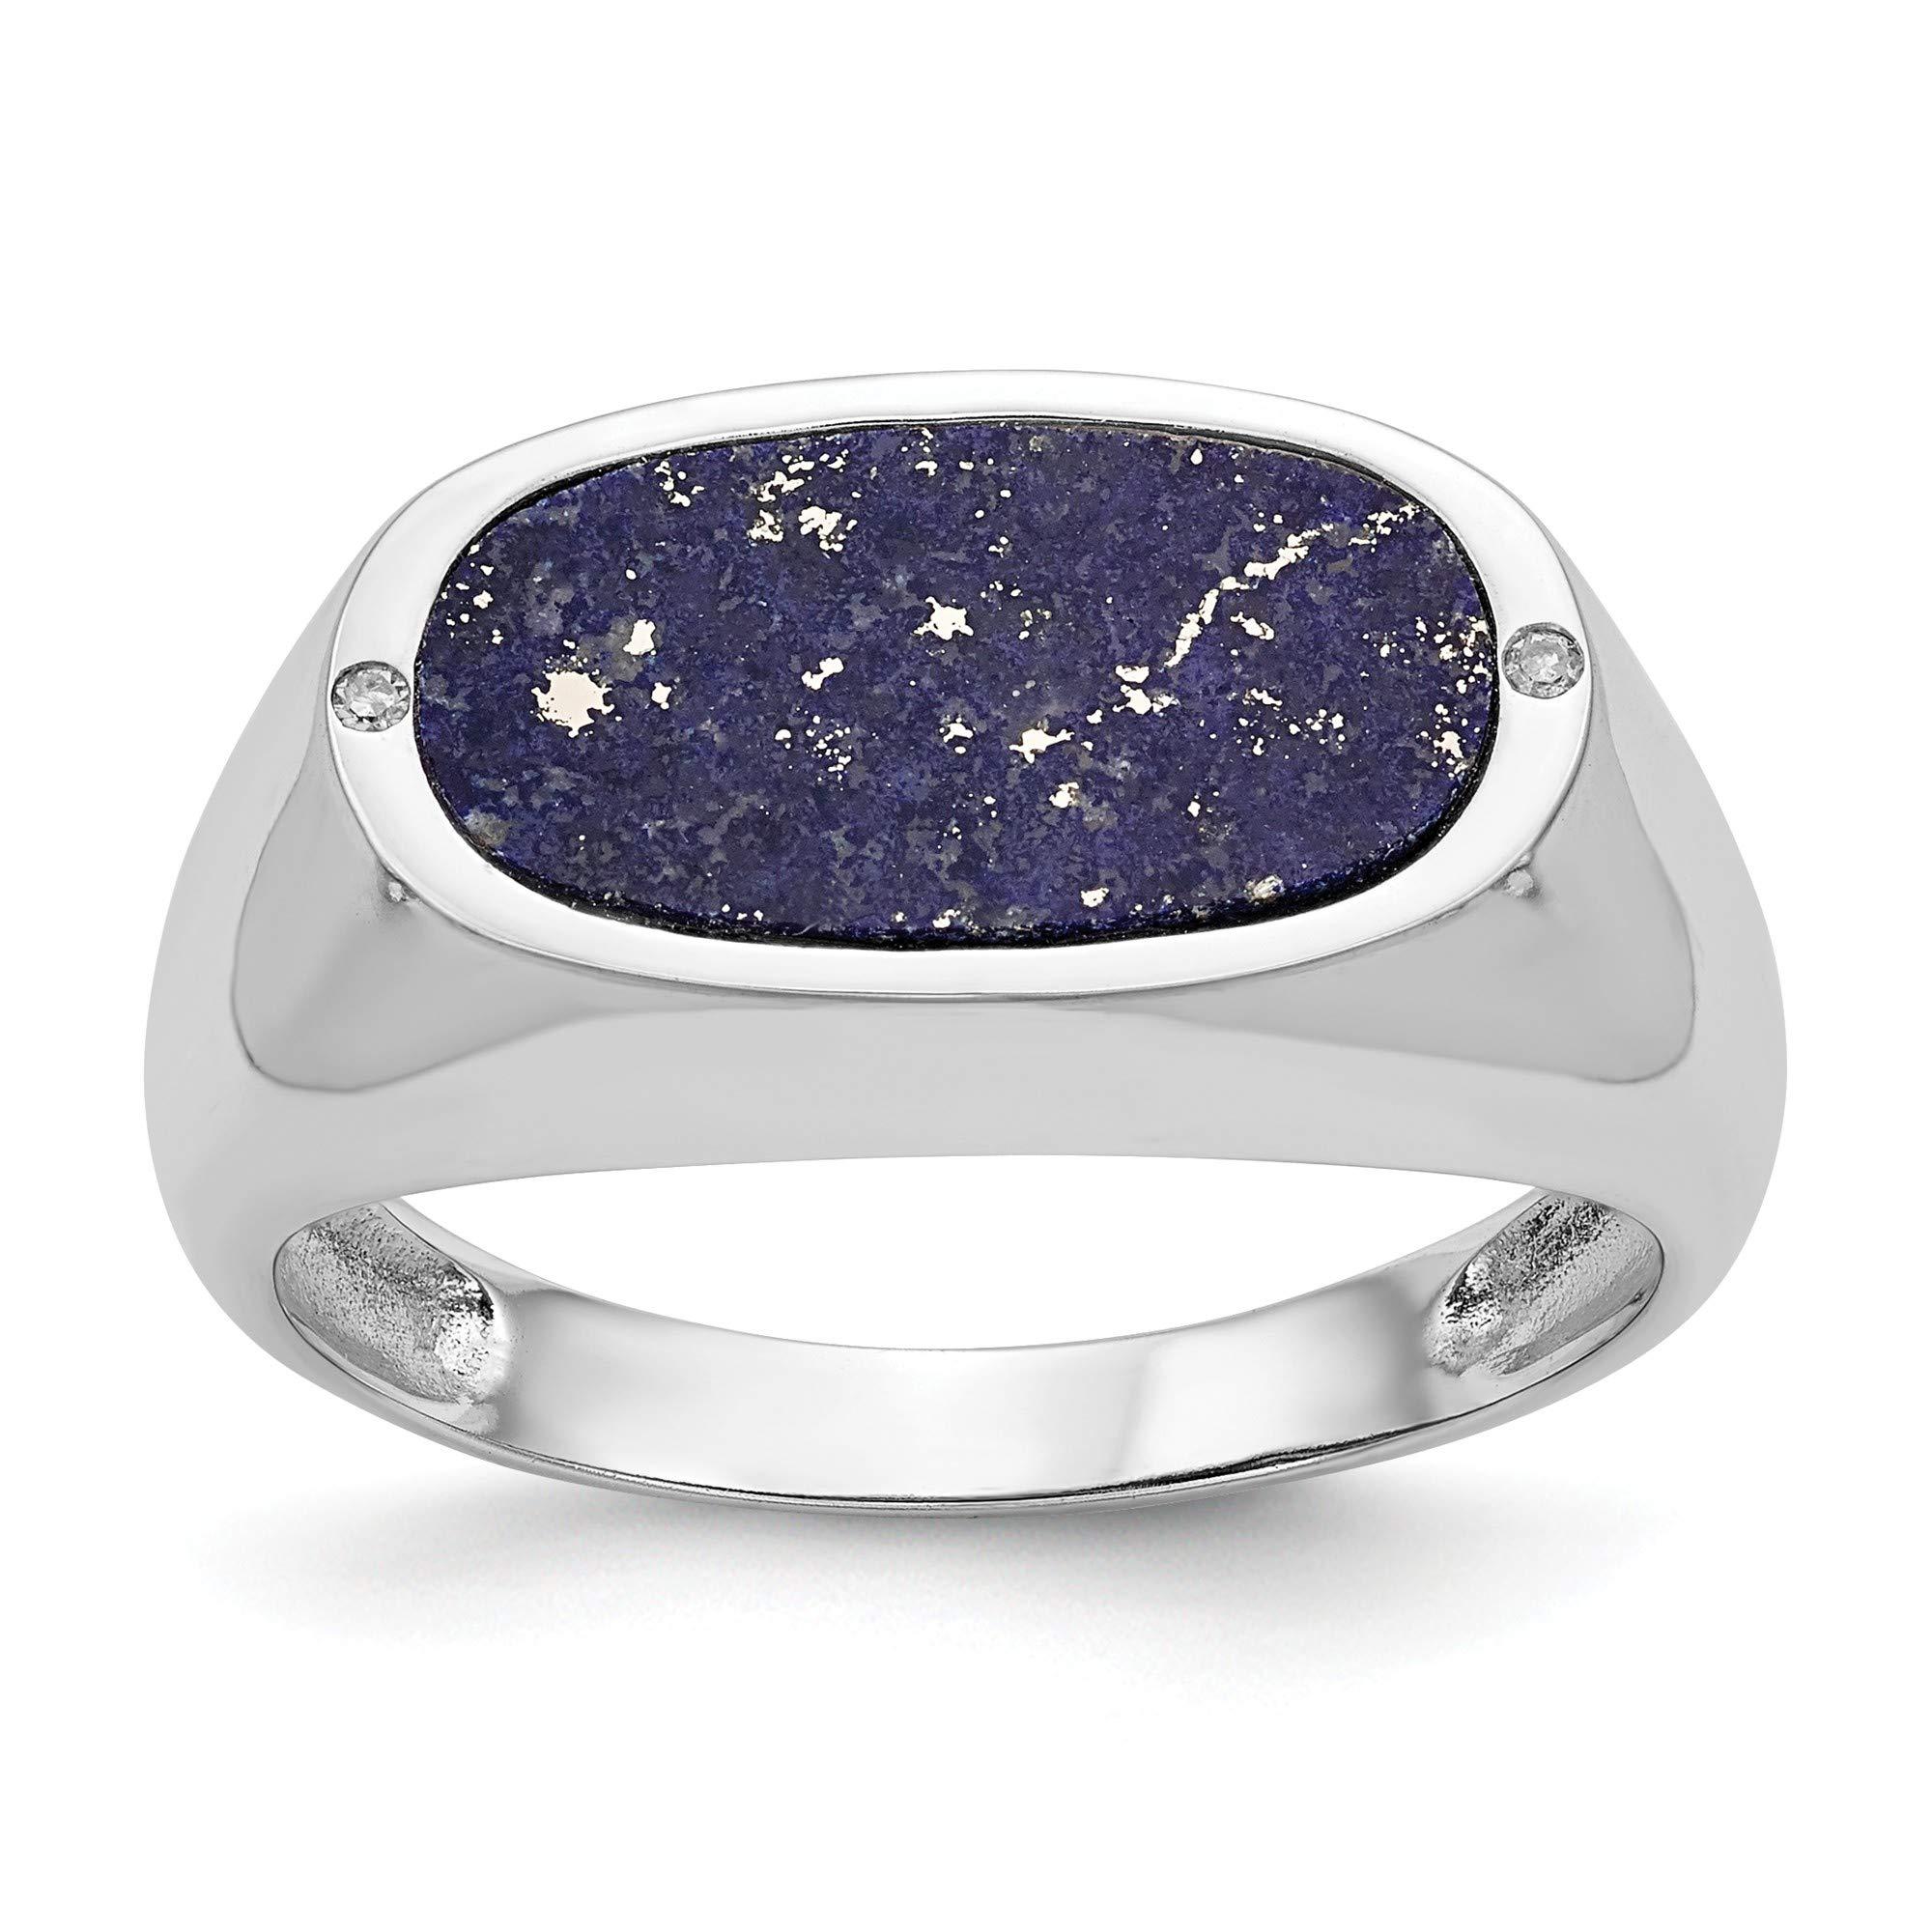 Bonyak Jewelry 14K White Gold Blue Lapis Diamond Ring - Size 10